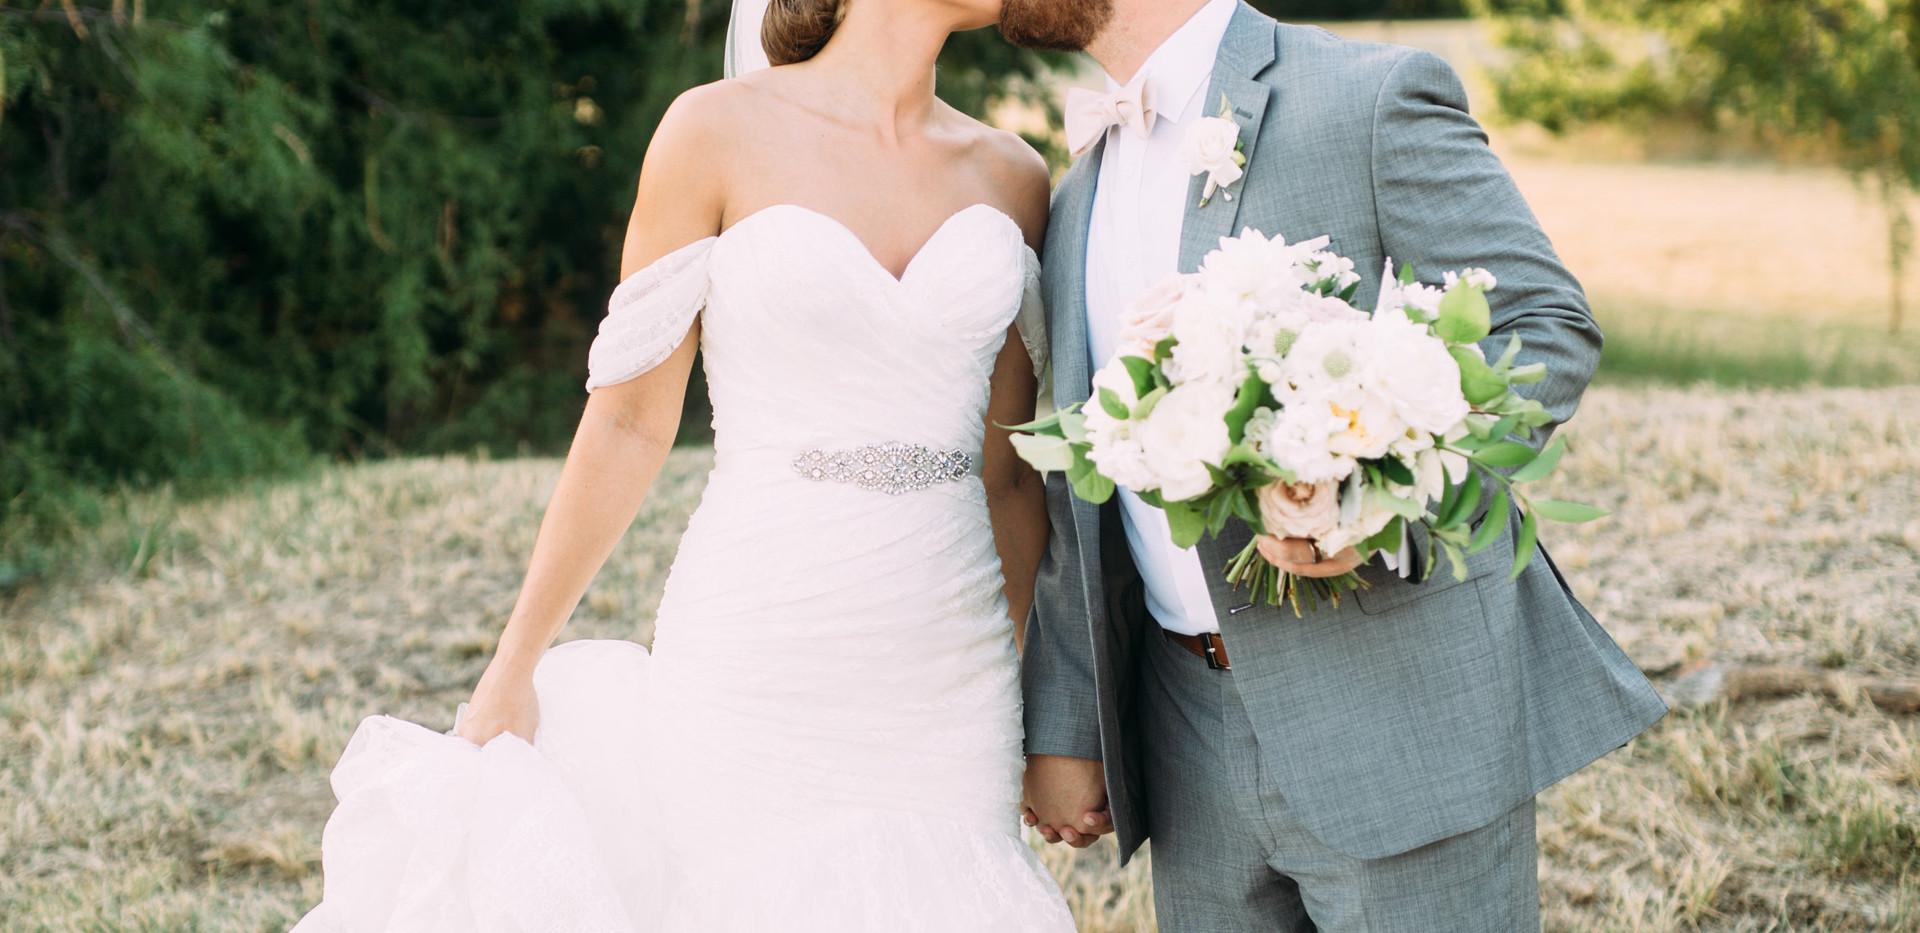 The Bride and Groom-0593.jpg